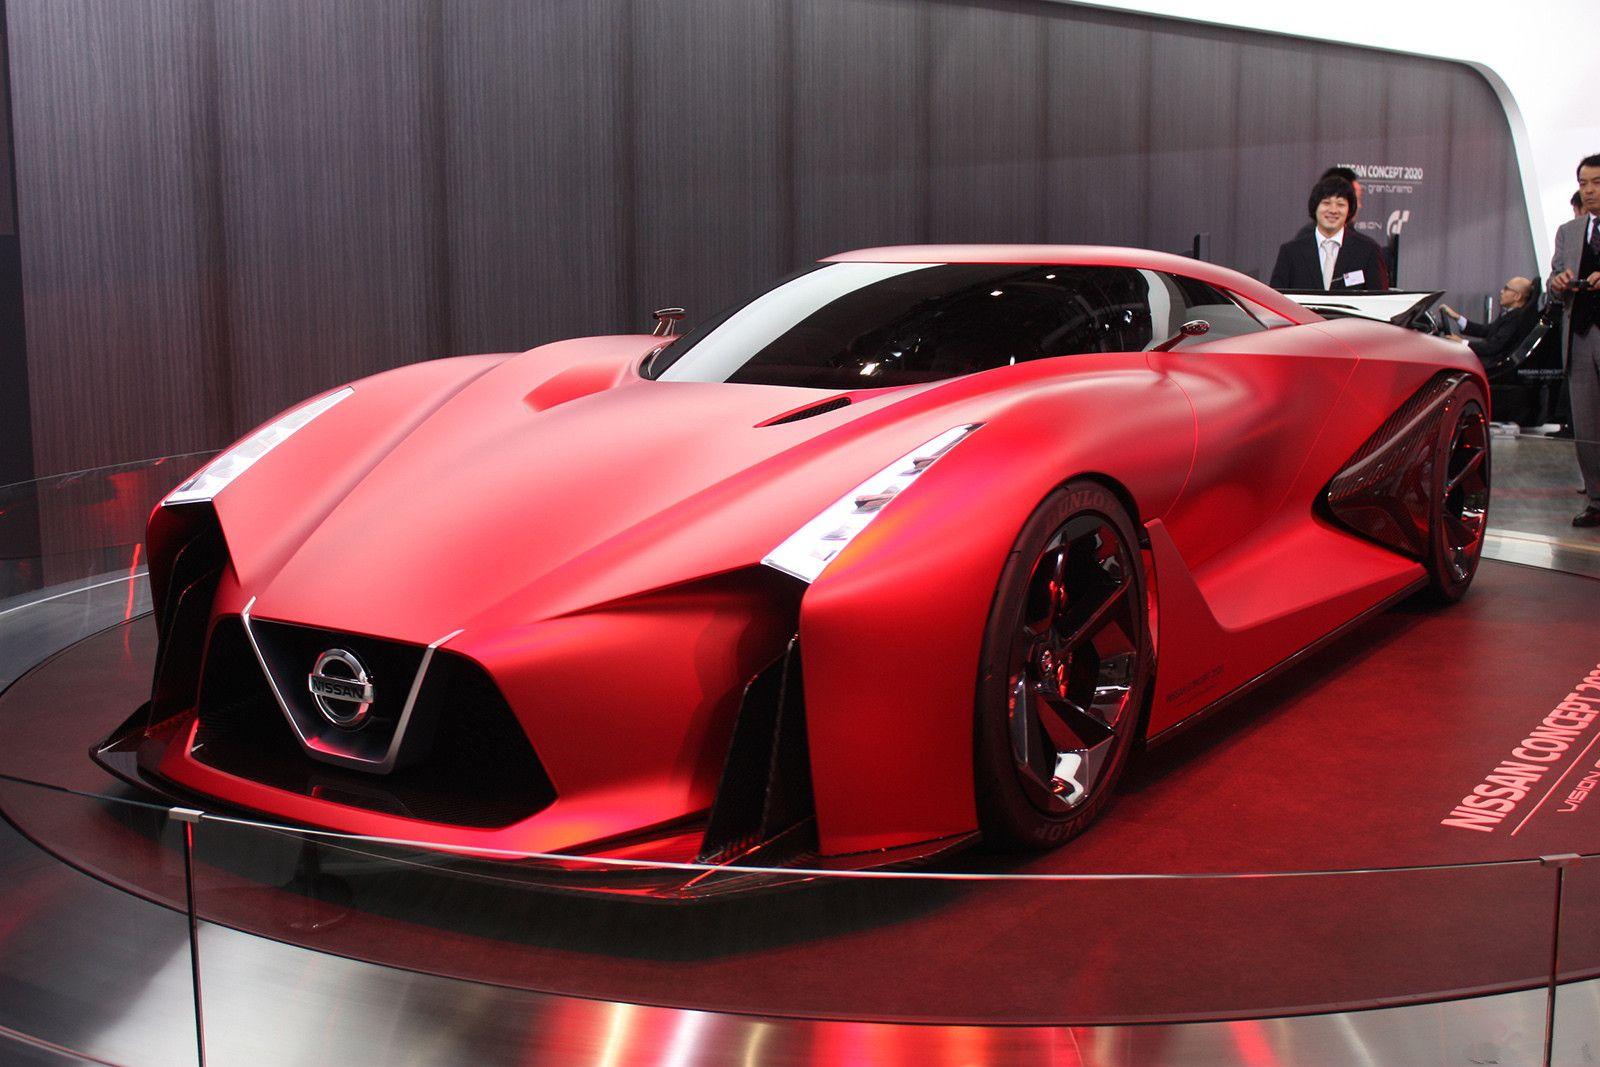 New Nissan Gtr Nissan Concept 2020 Vgt Nissan Coole Autos Sportwagen